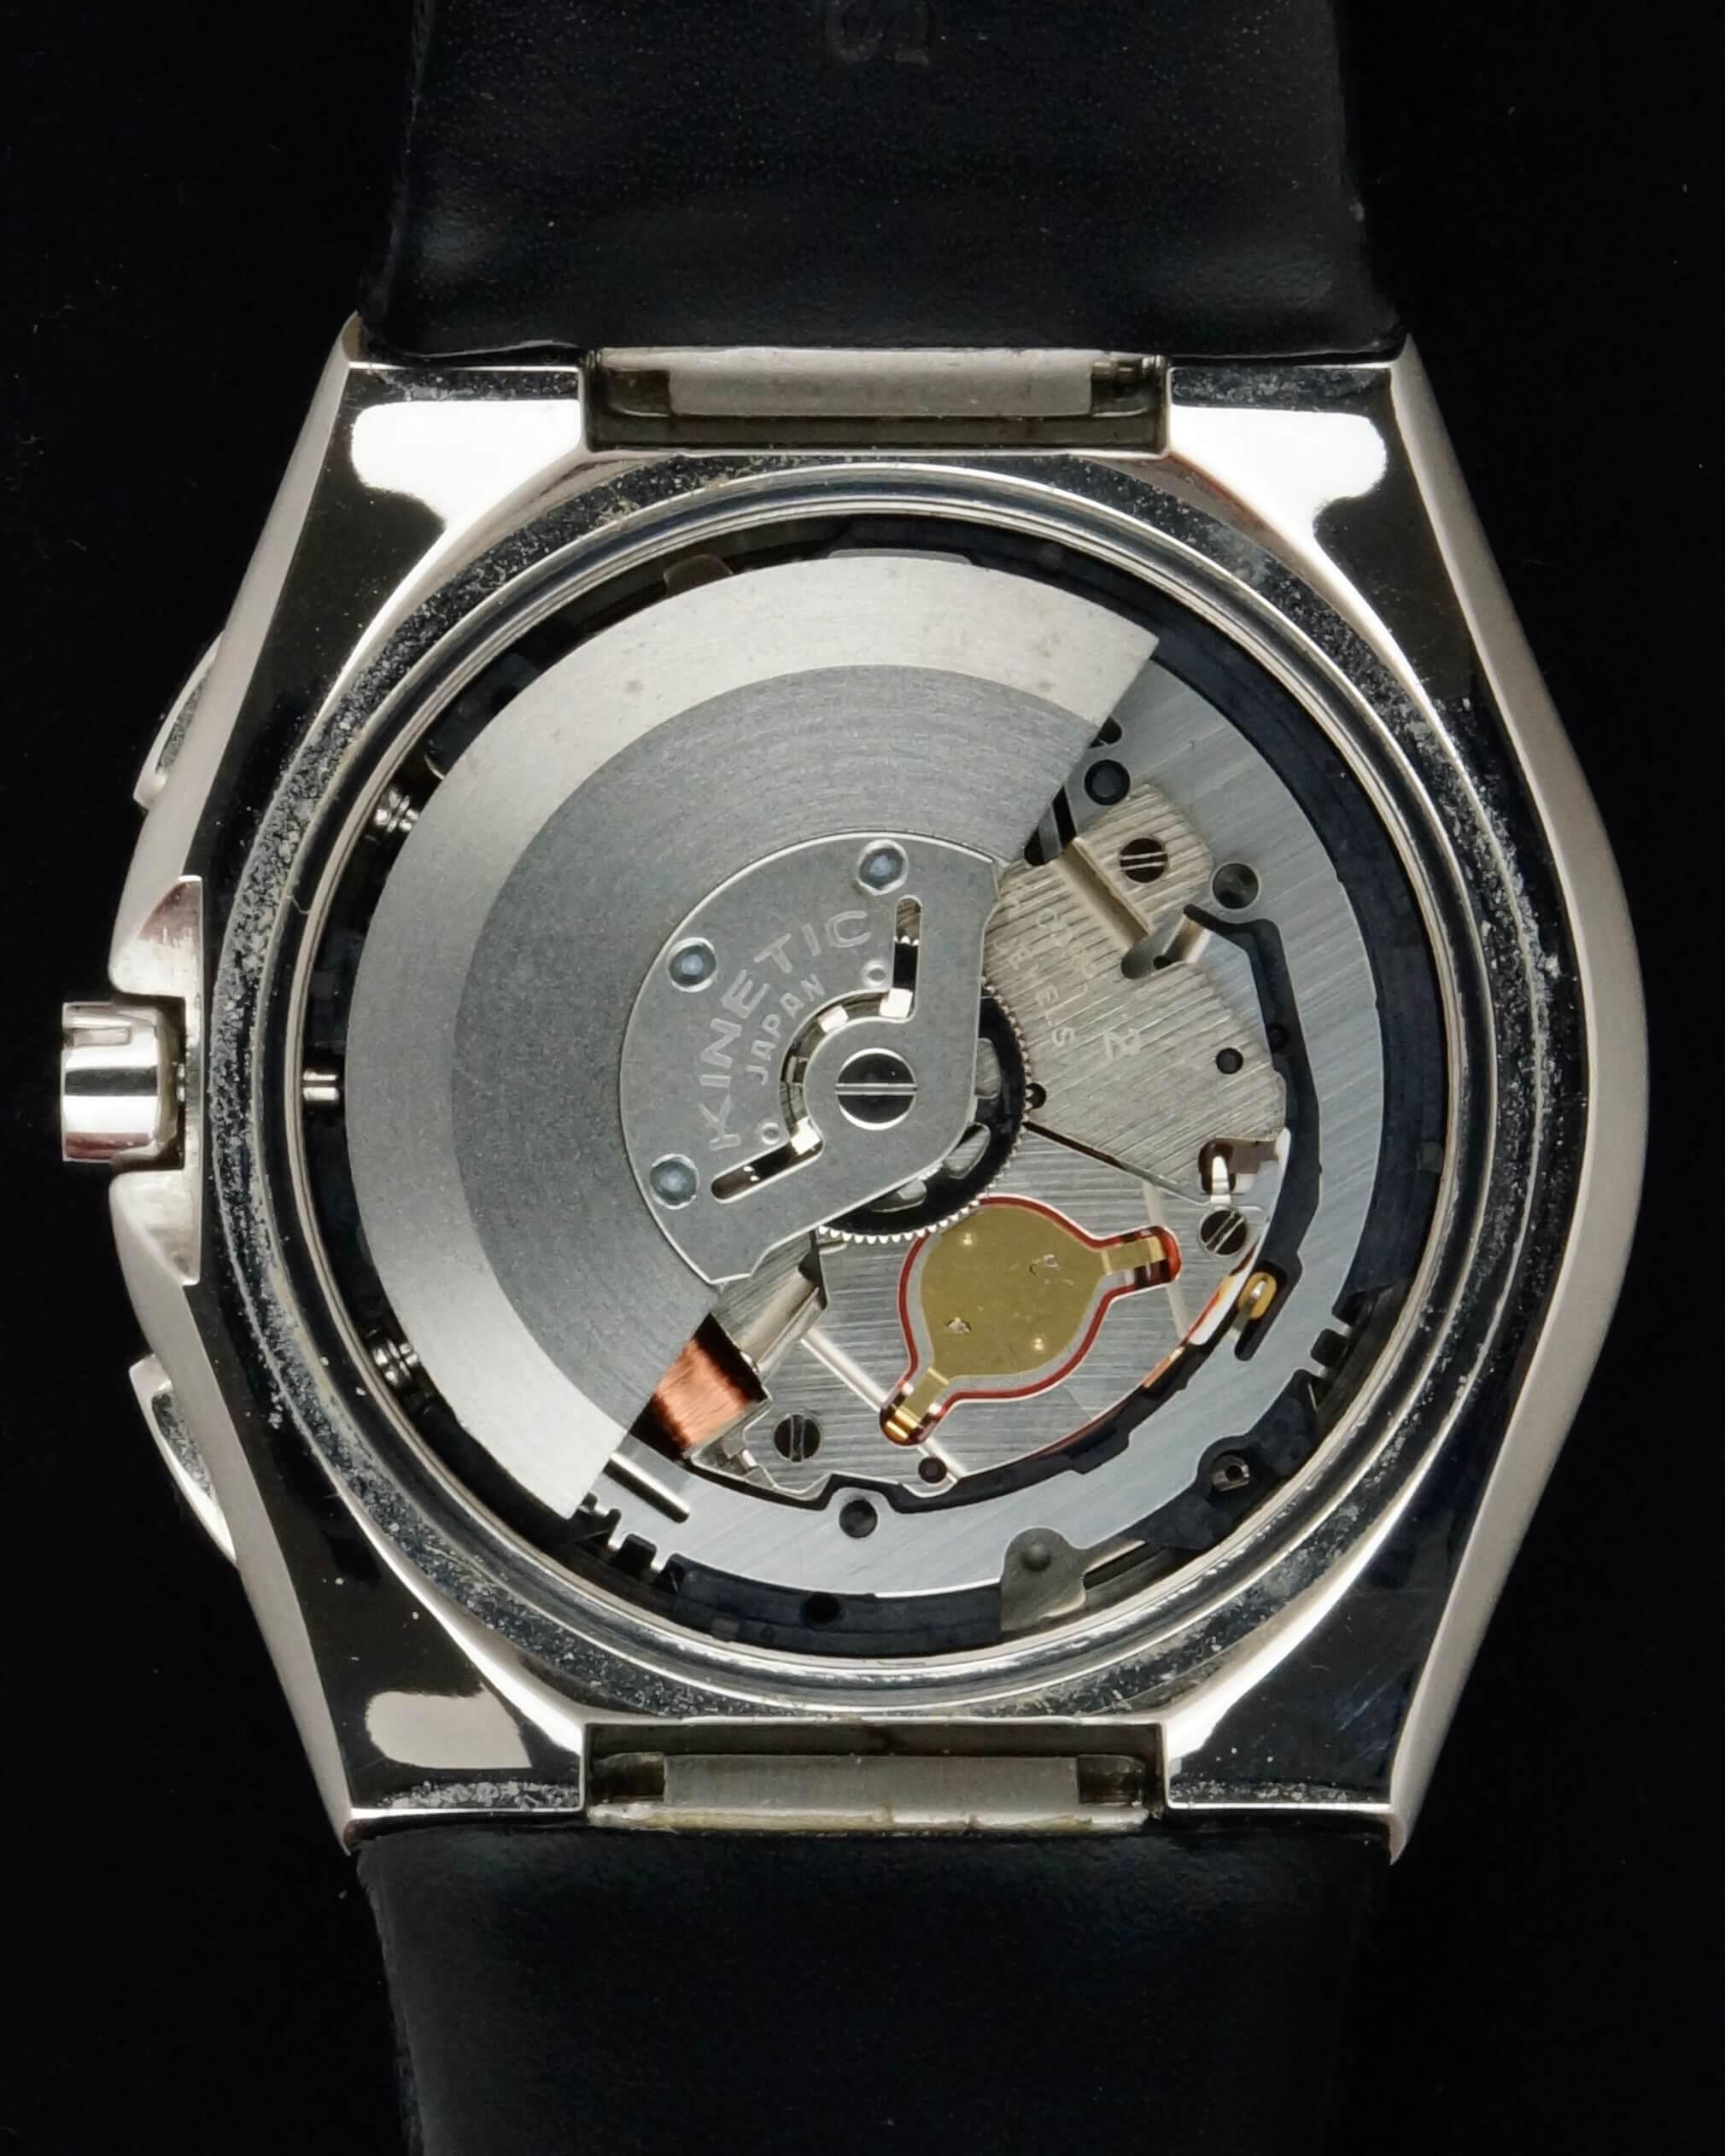 seiko arctura kinetic chronograph 2006 la clinique horlog re service et vente de montres. Black Bedroom Furniture Sets. Home Design Ideas